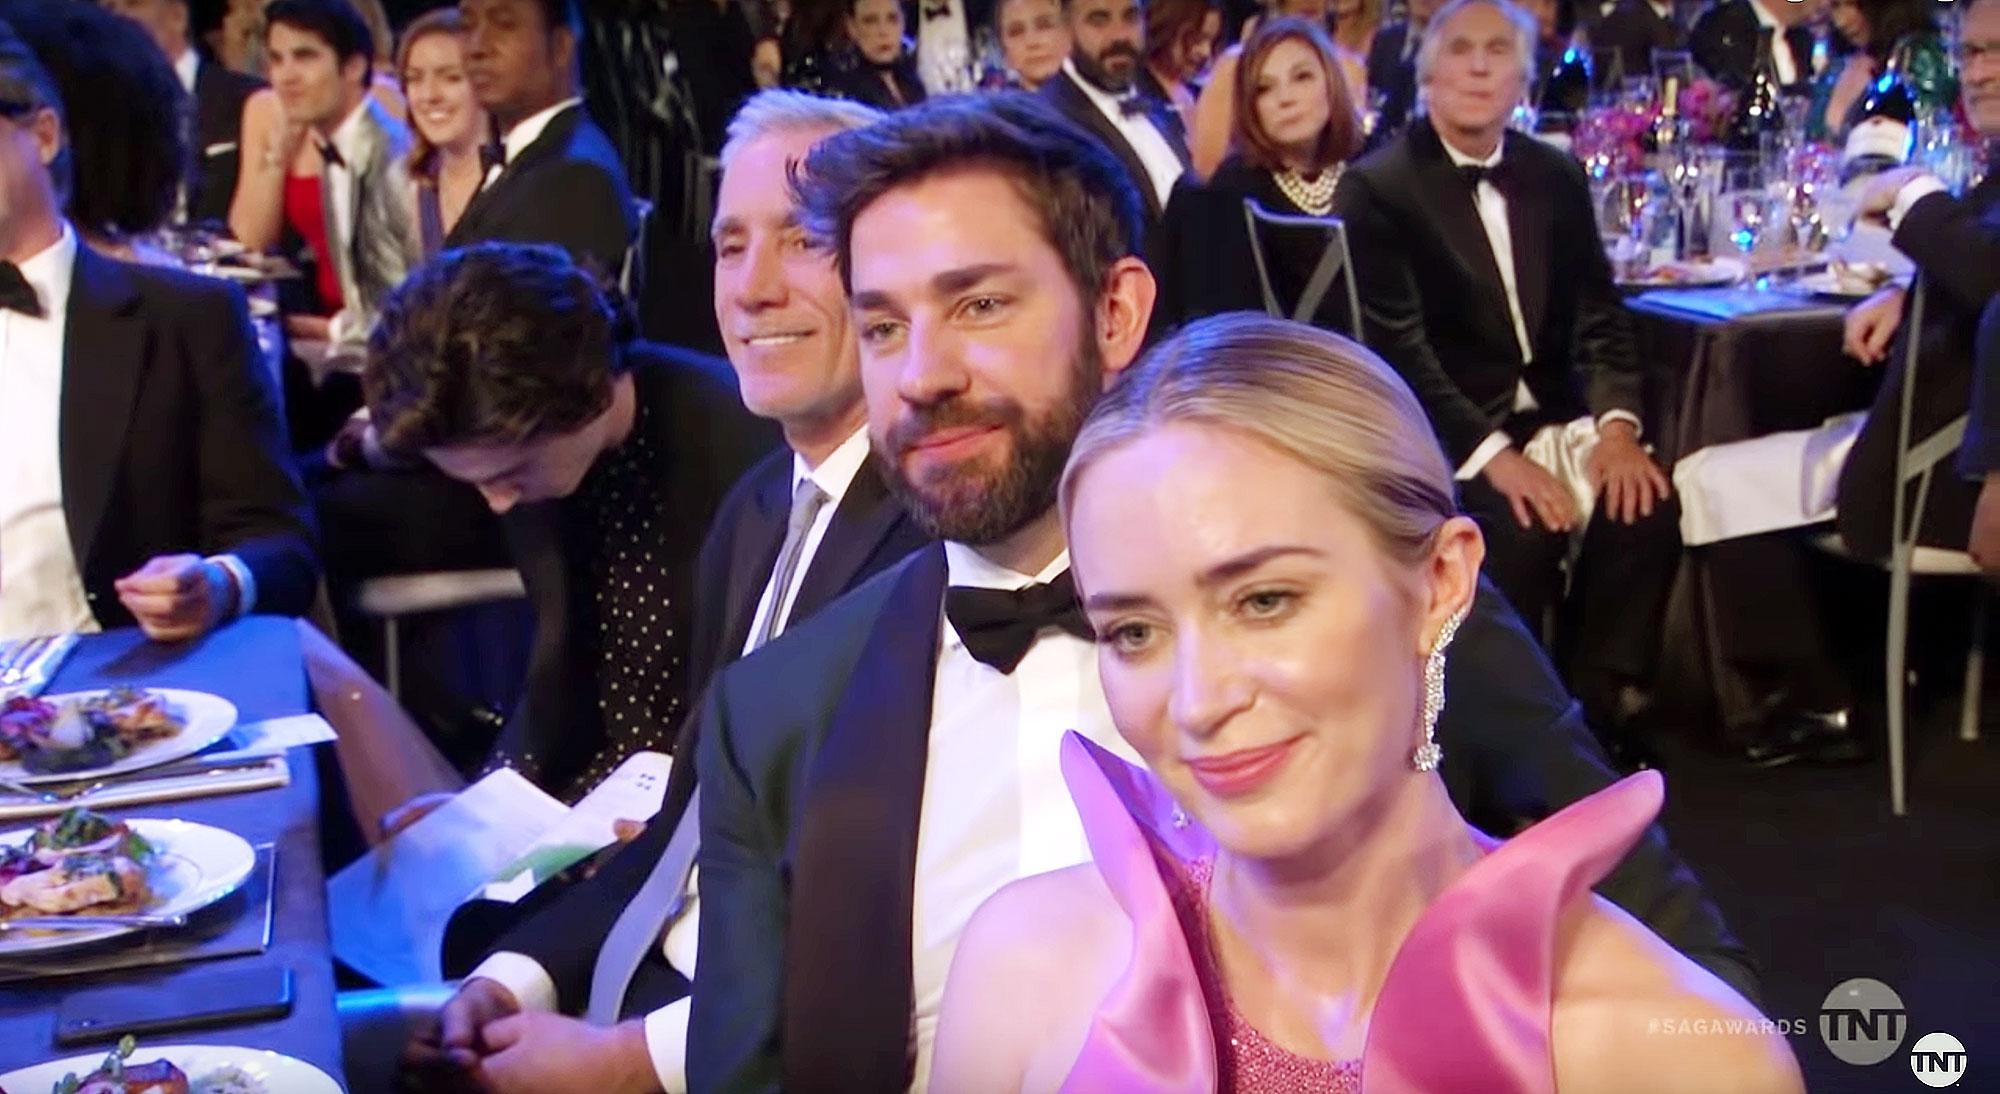 Timothee Chalamet Caught Reading SAG Awards 2019 During Opening Monologue